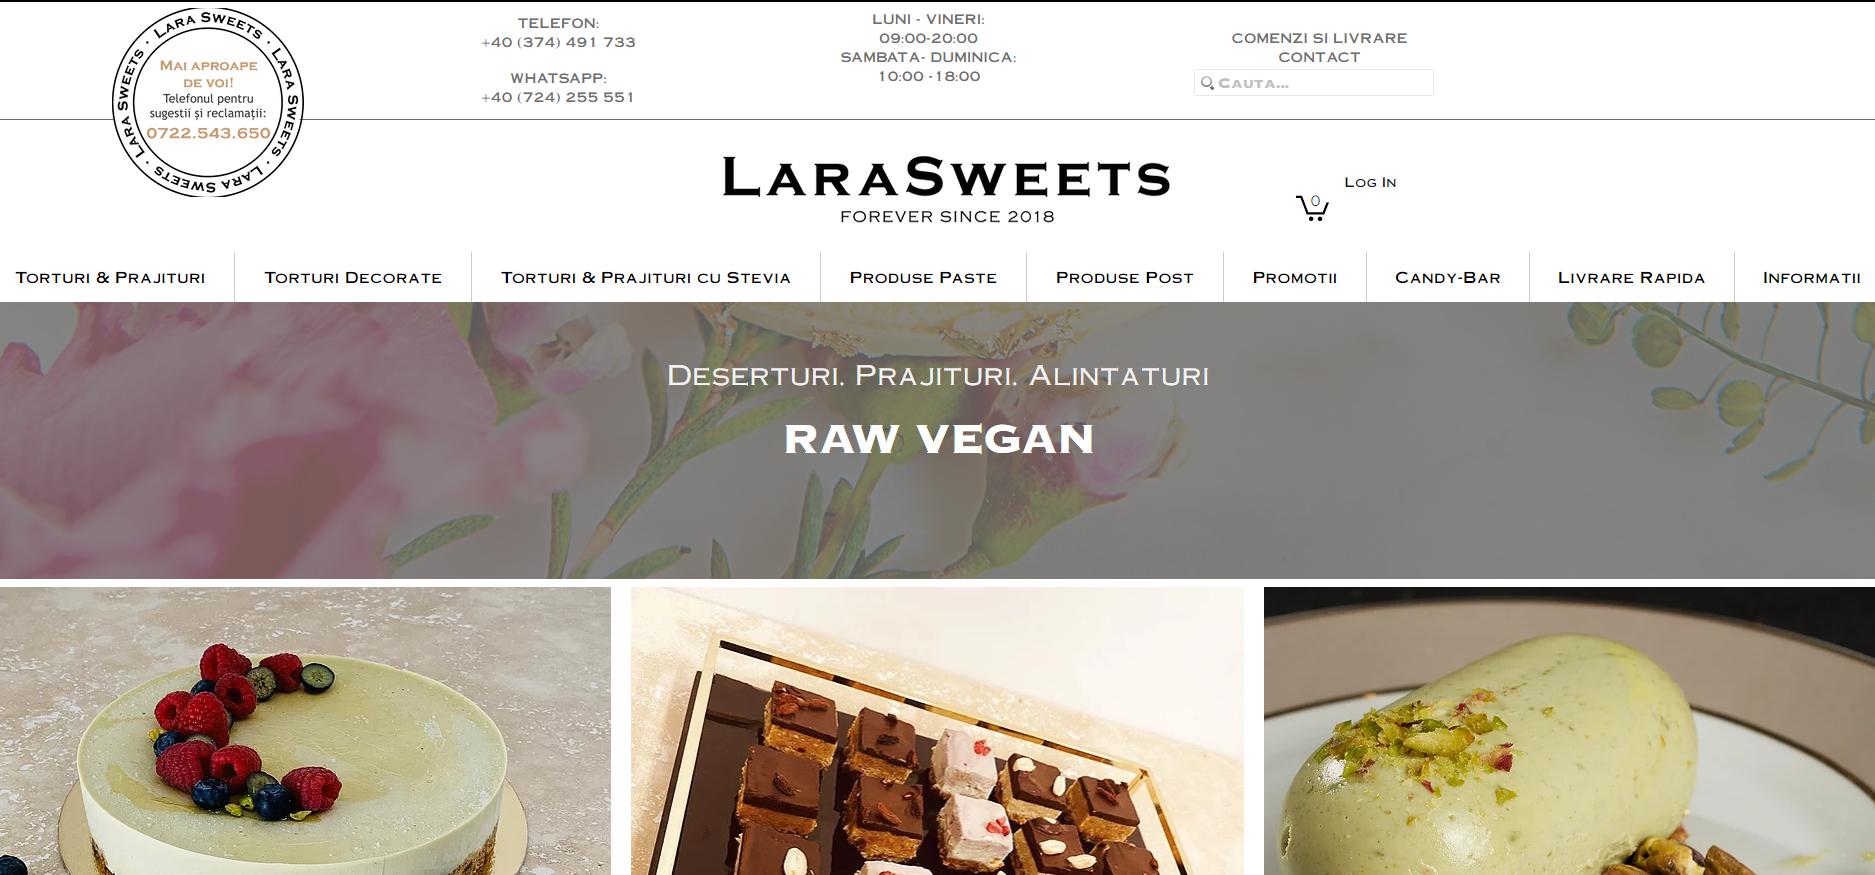 lara sweets web page